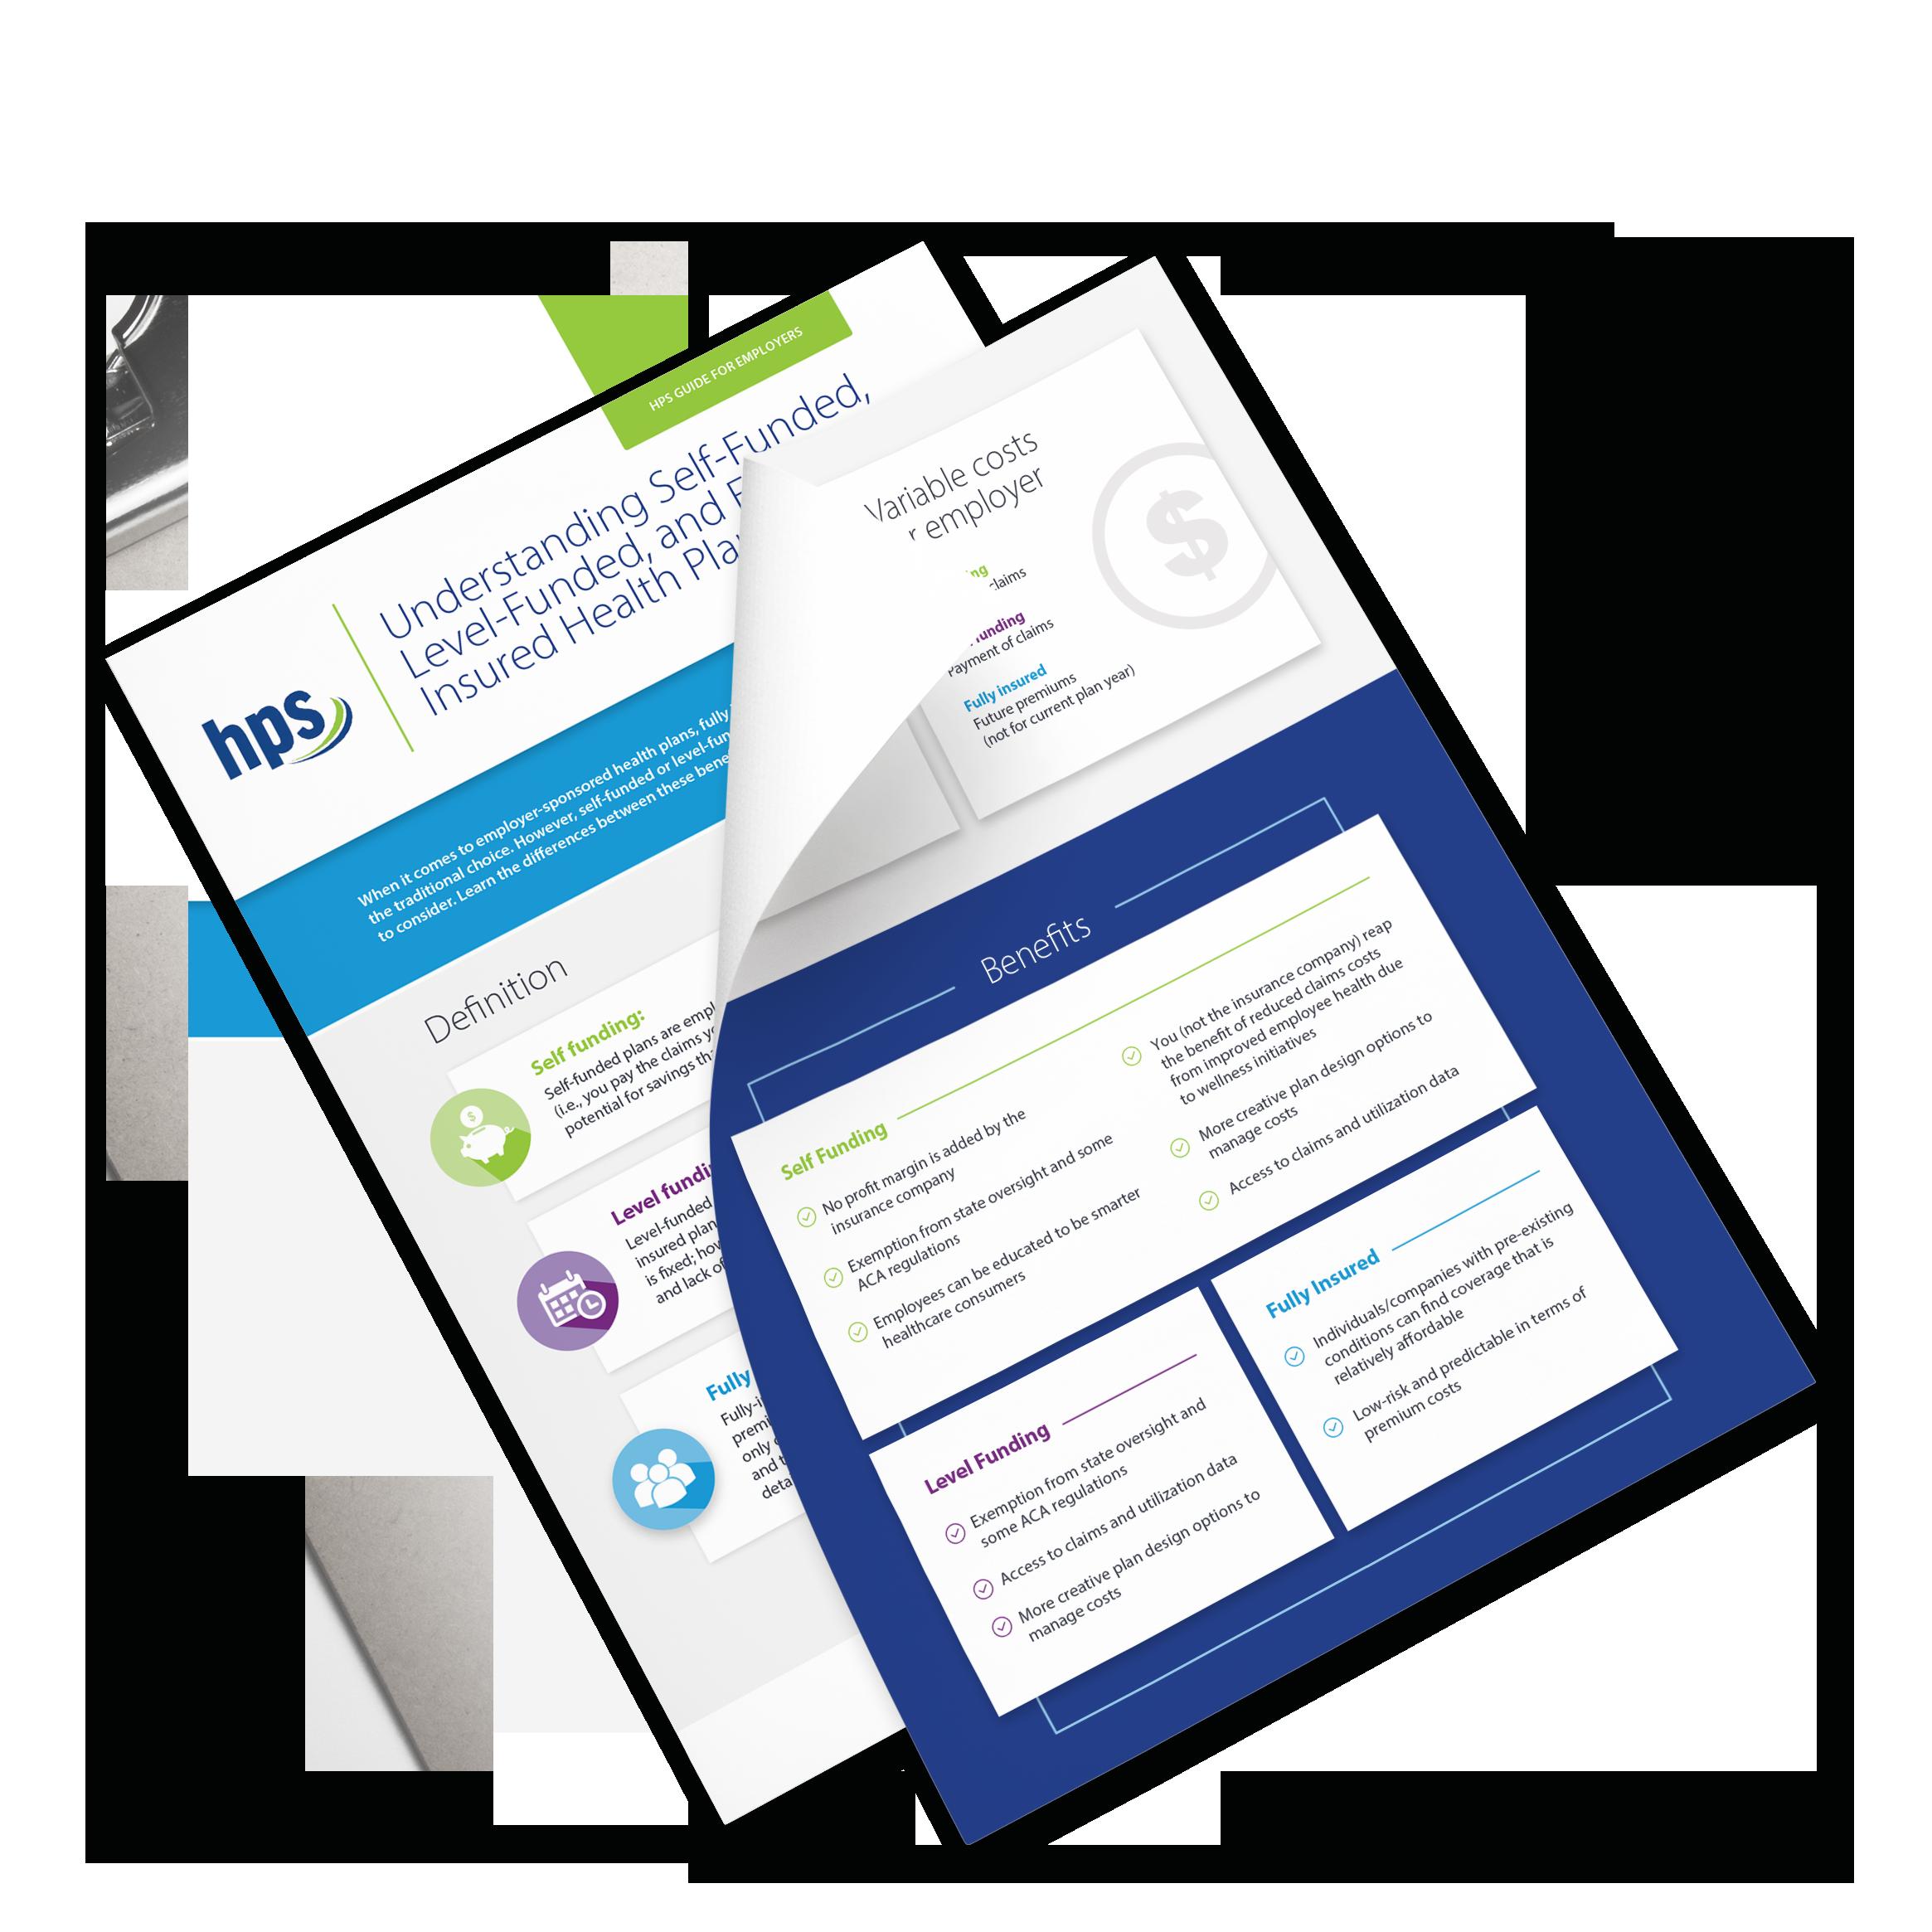 HPS Self-funding Guide for Employers